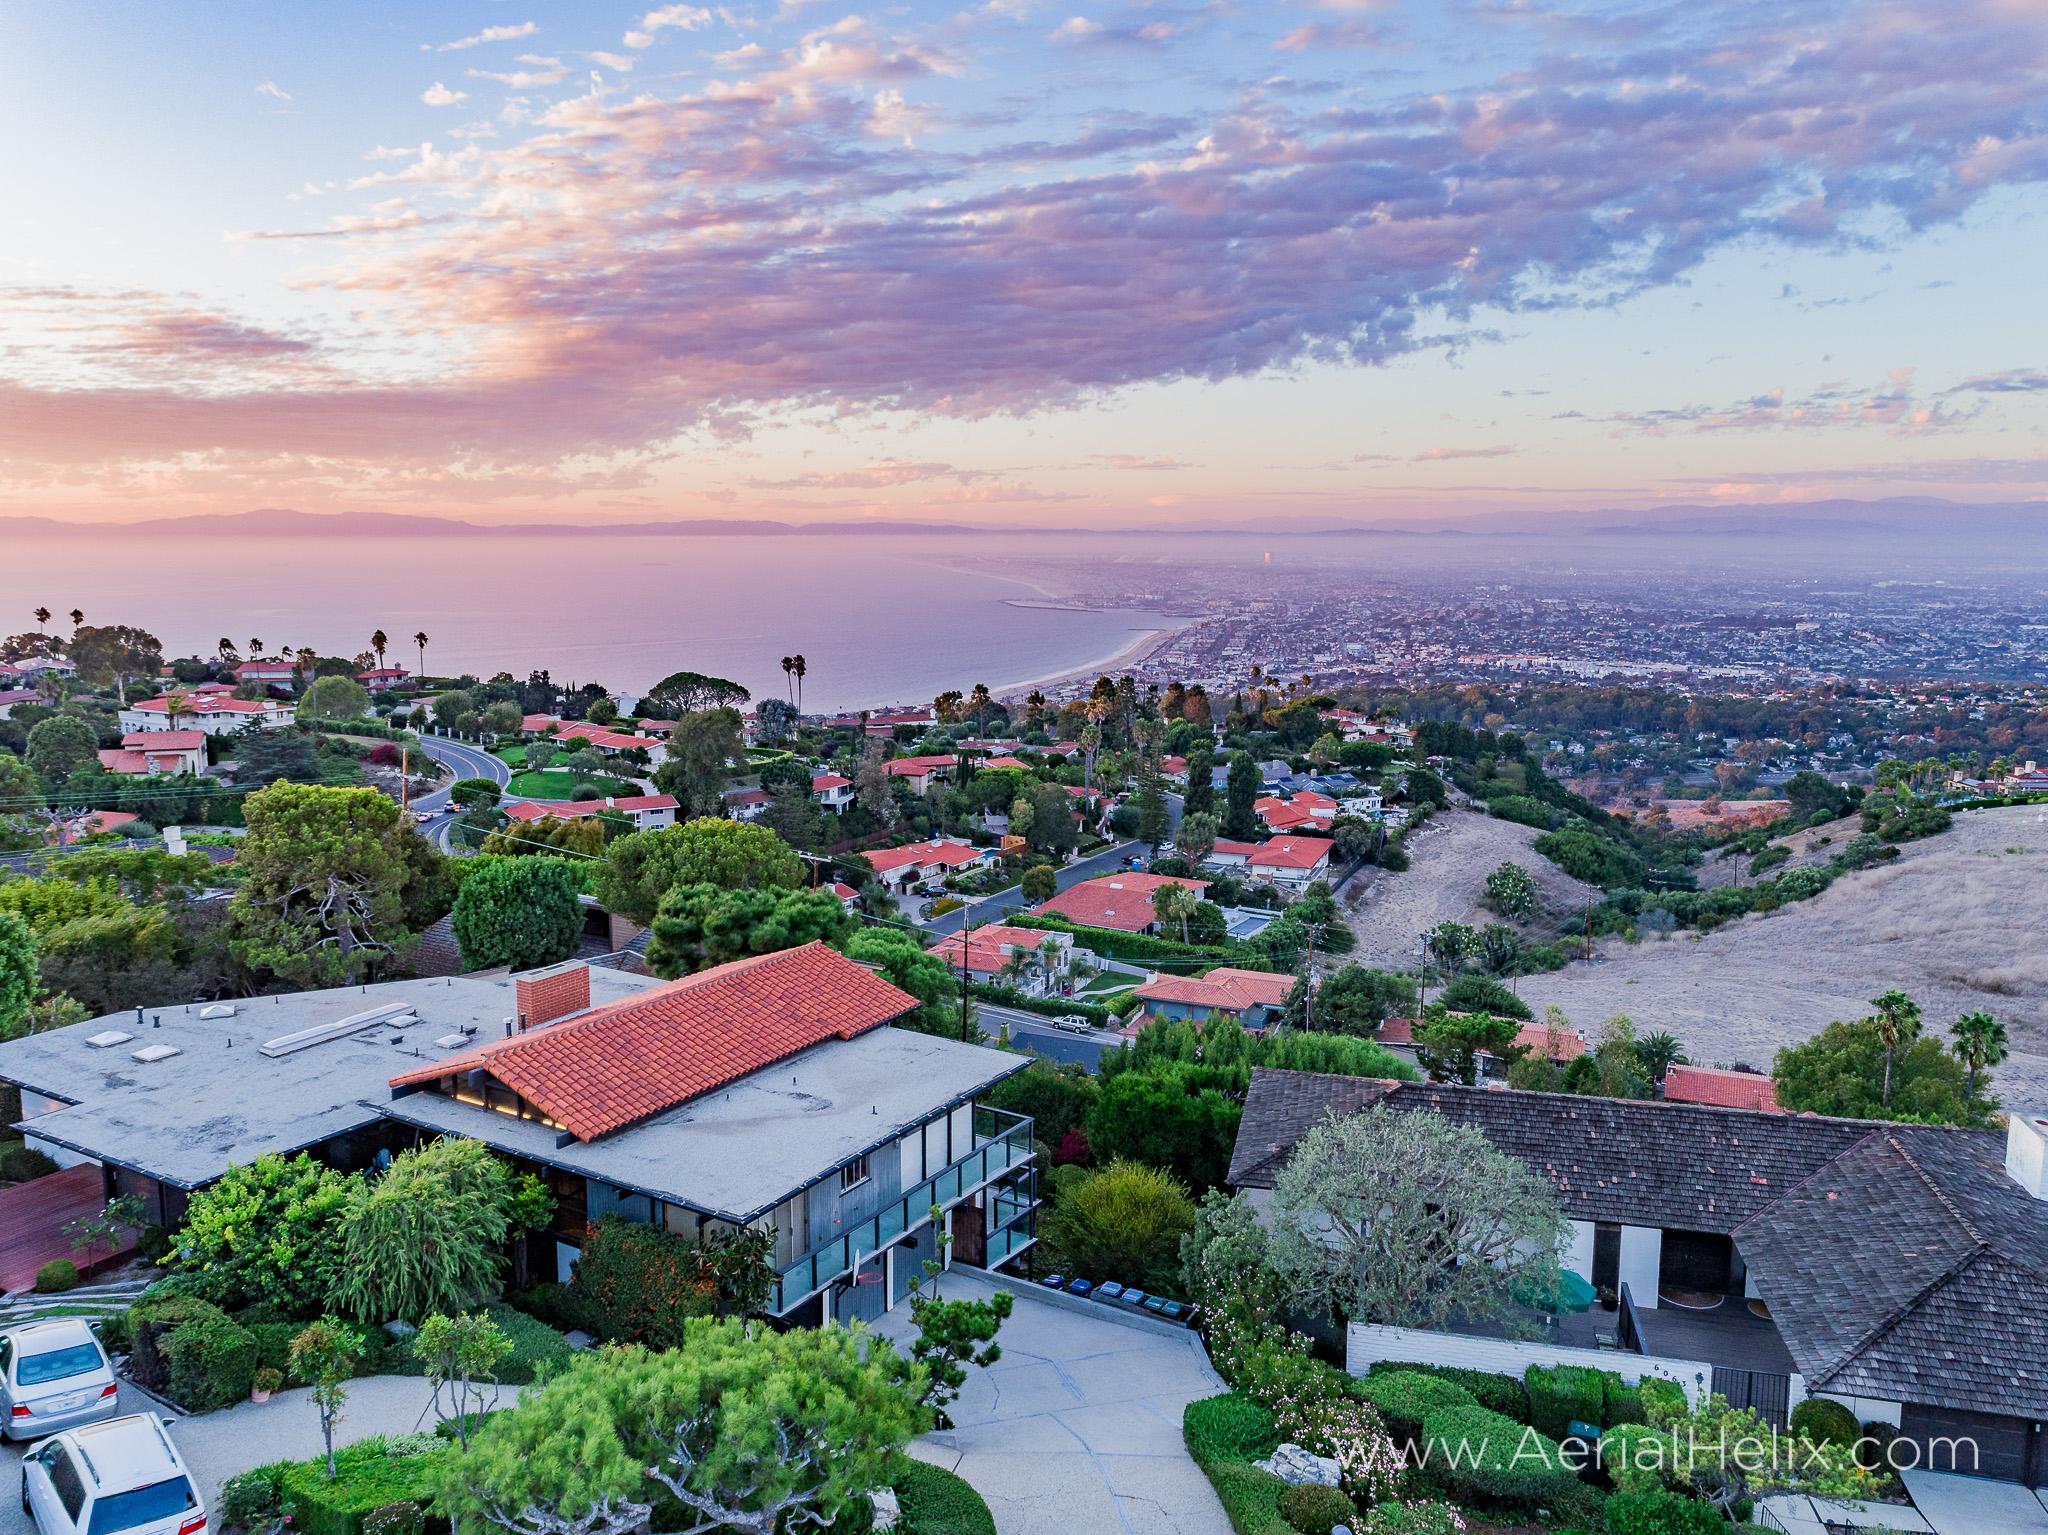 Woodfern Drive - HELIX Real Estate Aerial Photographer-29.jpg